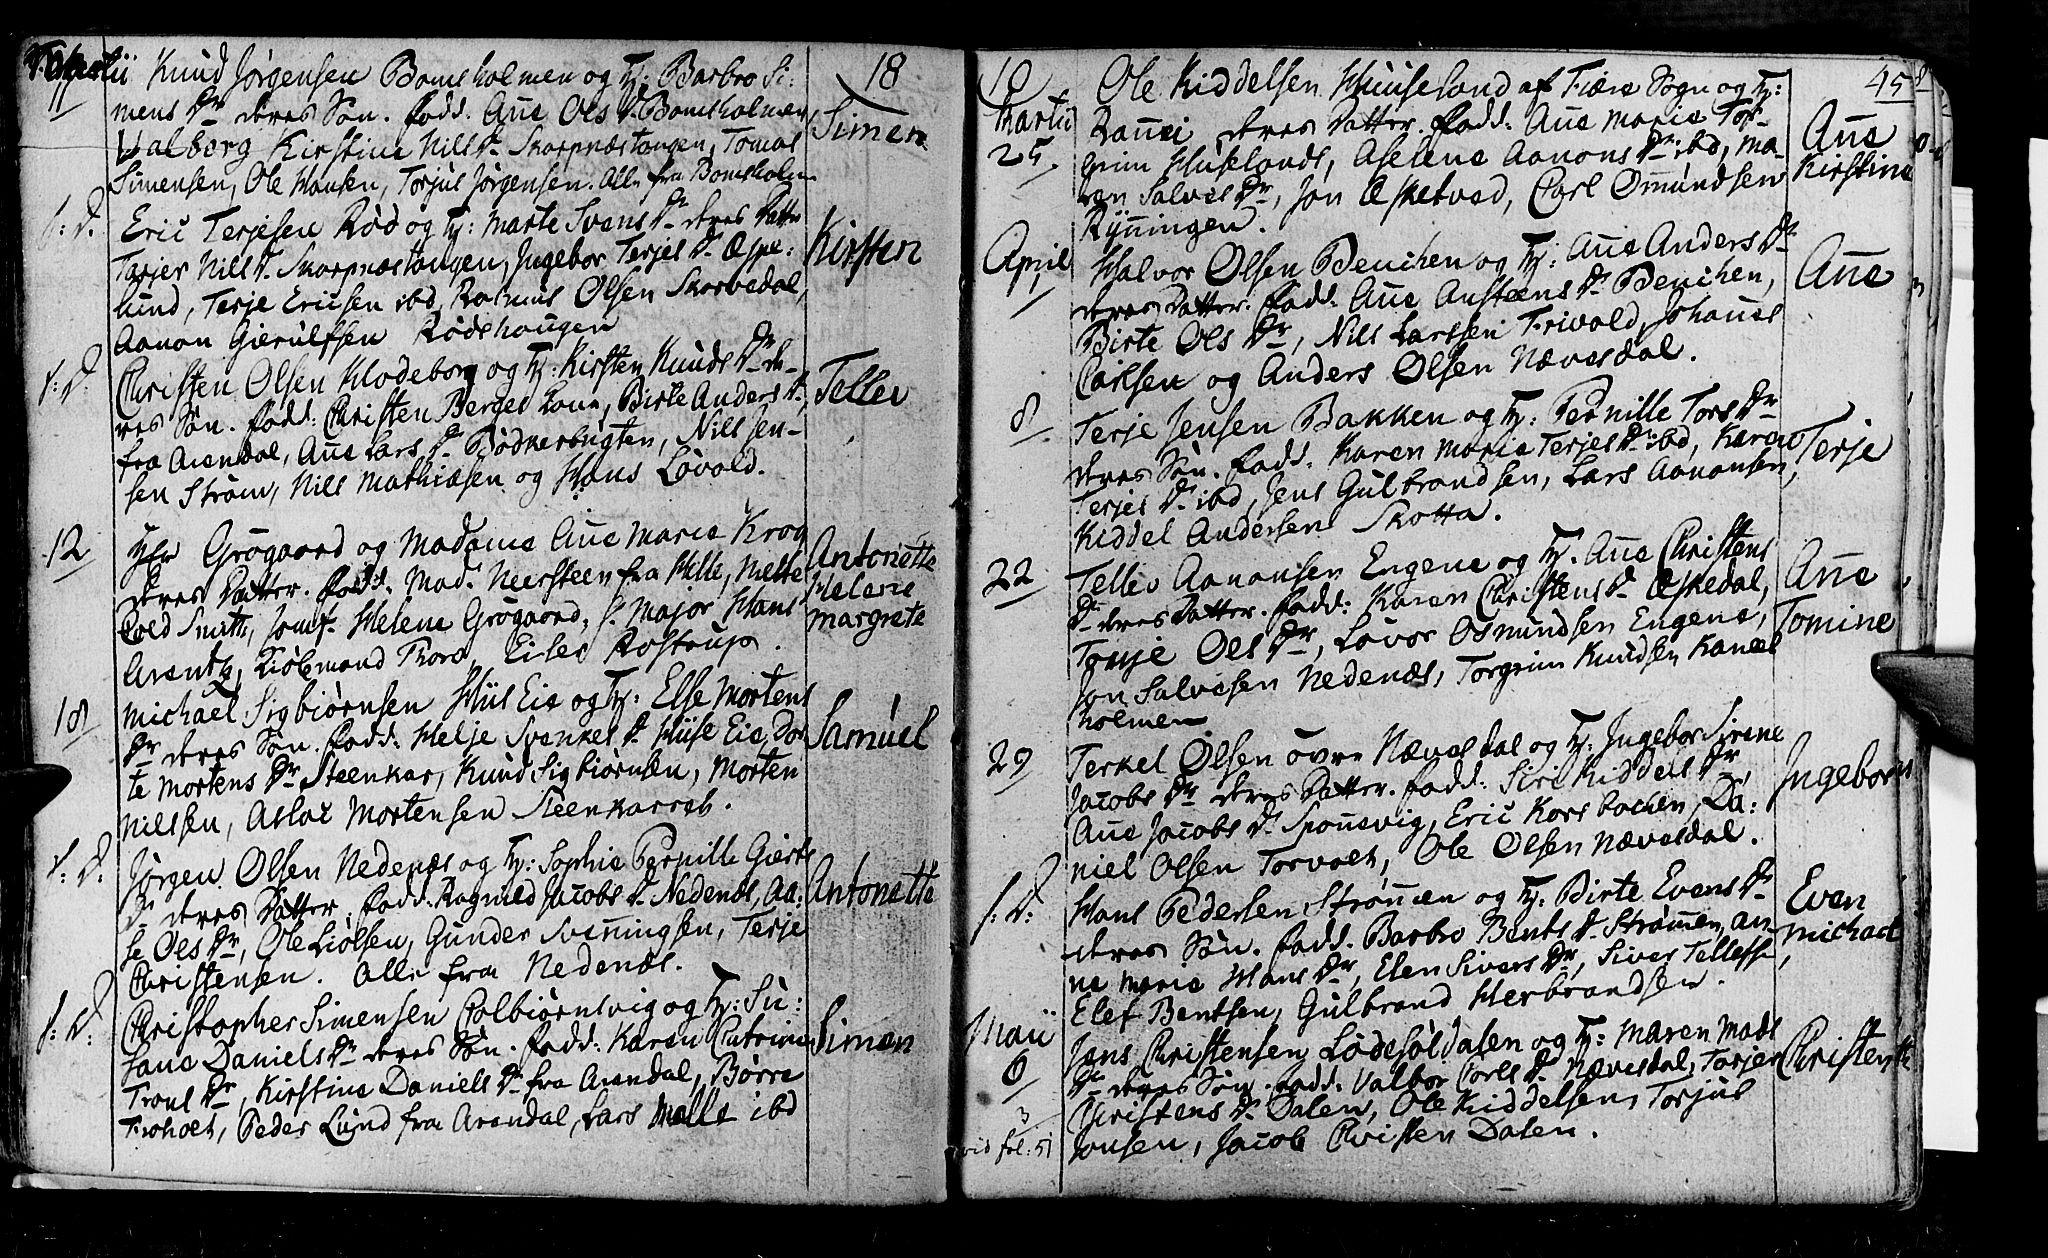 SAK, Øyestad sokneprestkontor, F/Fa/L0011: Ministerialbok nr. A 11, 1805-1824, s. 45